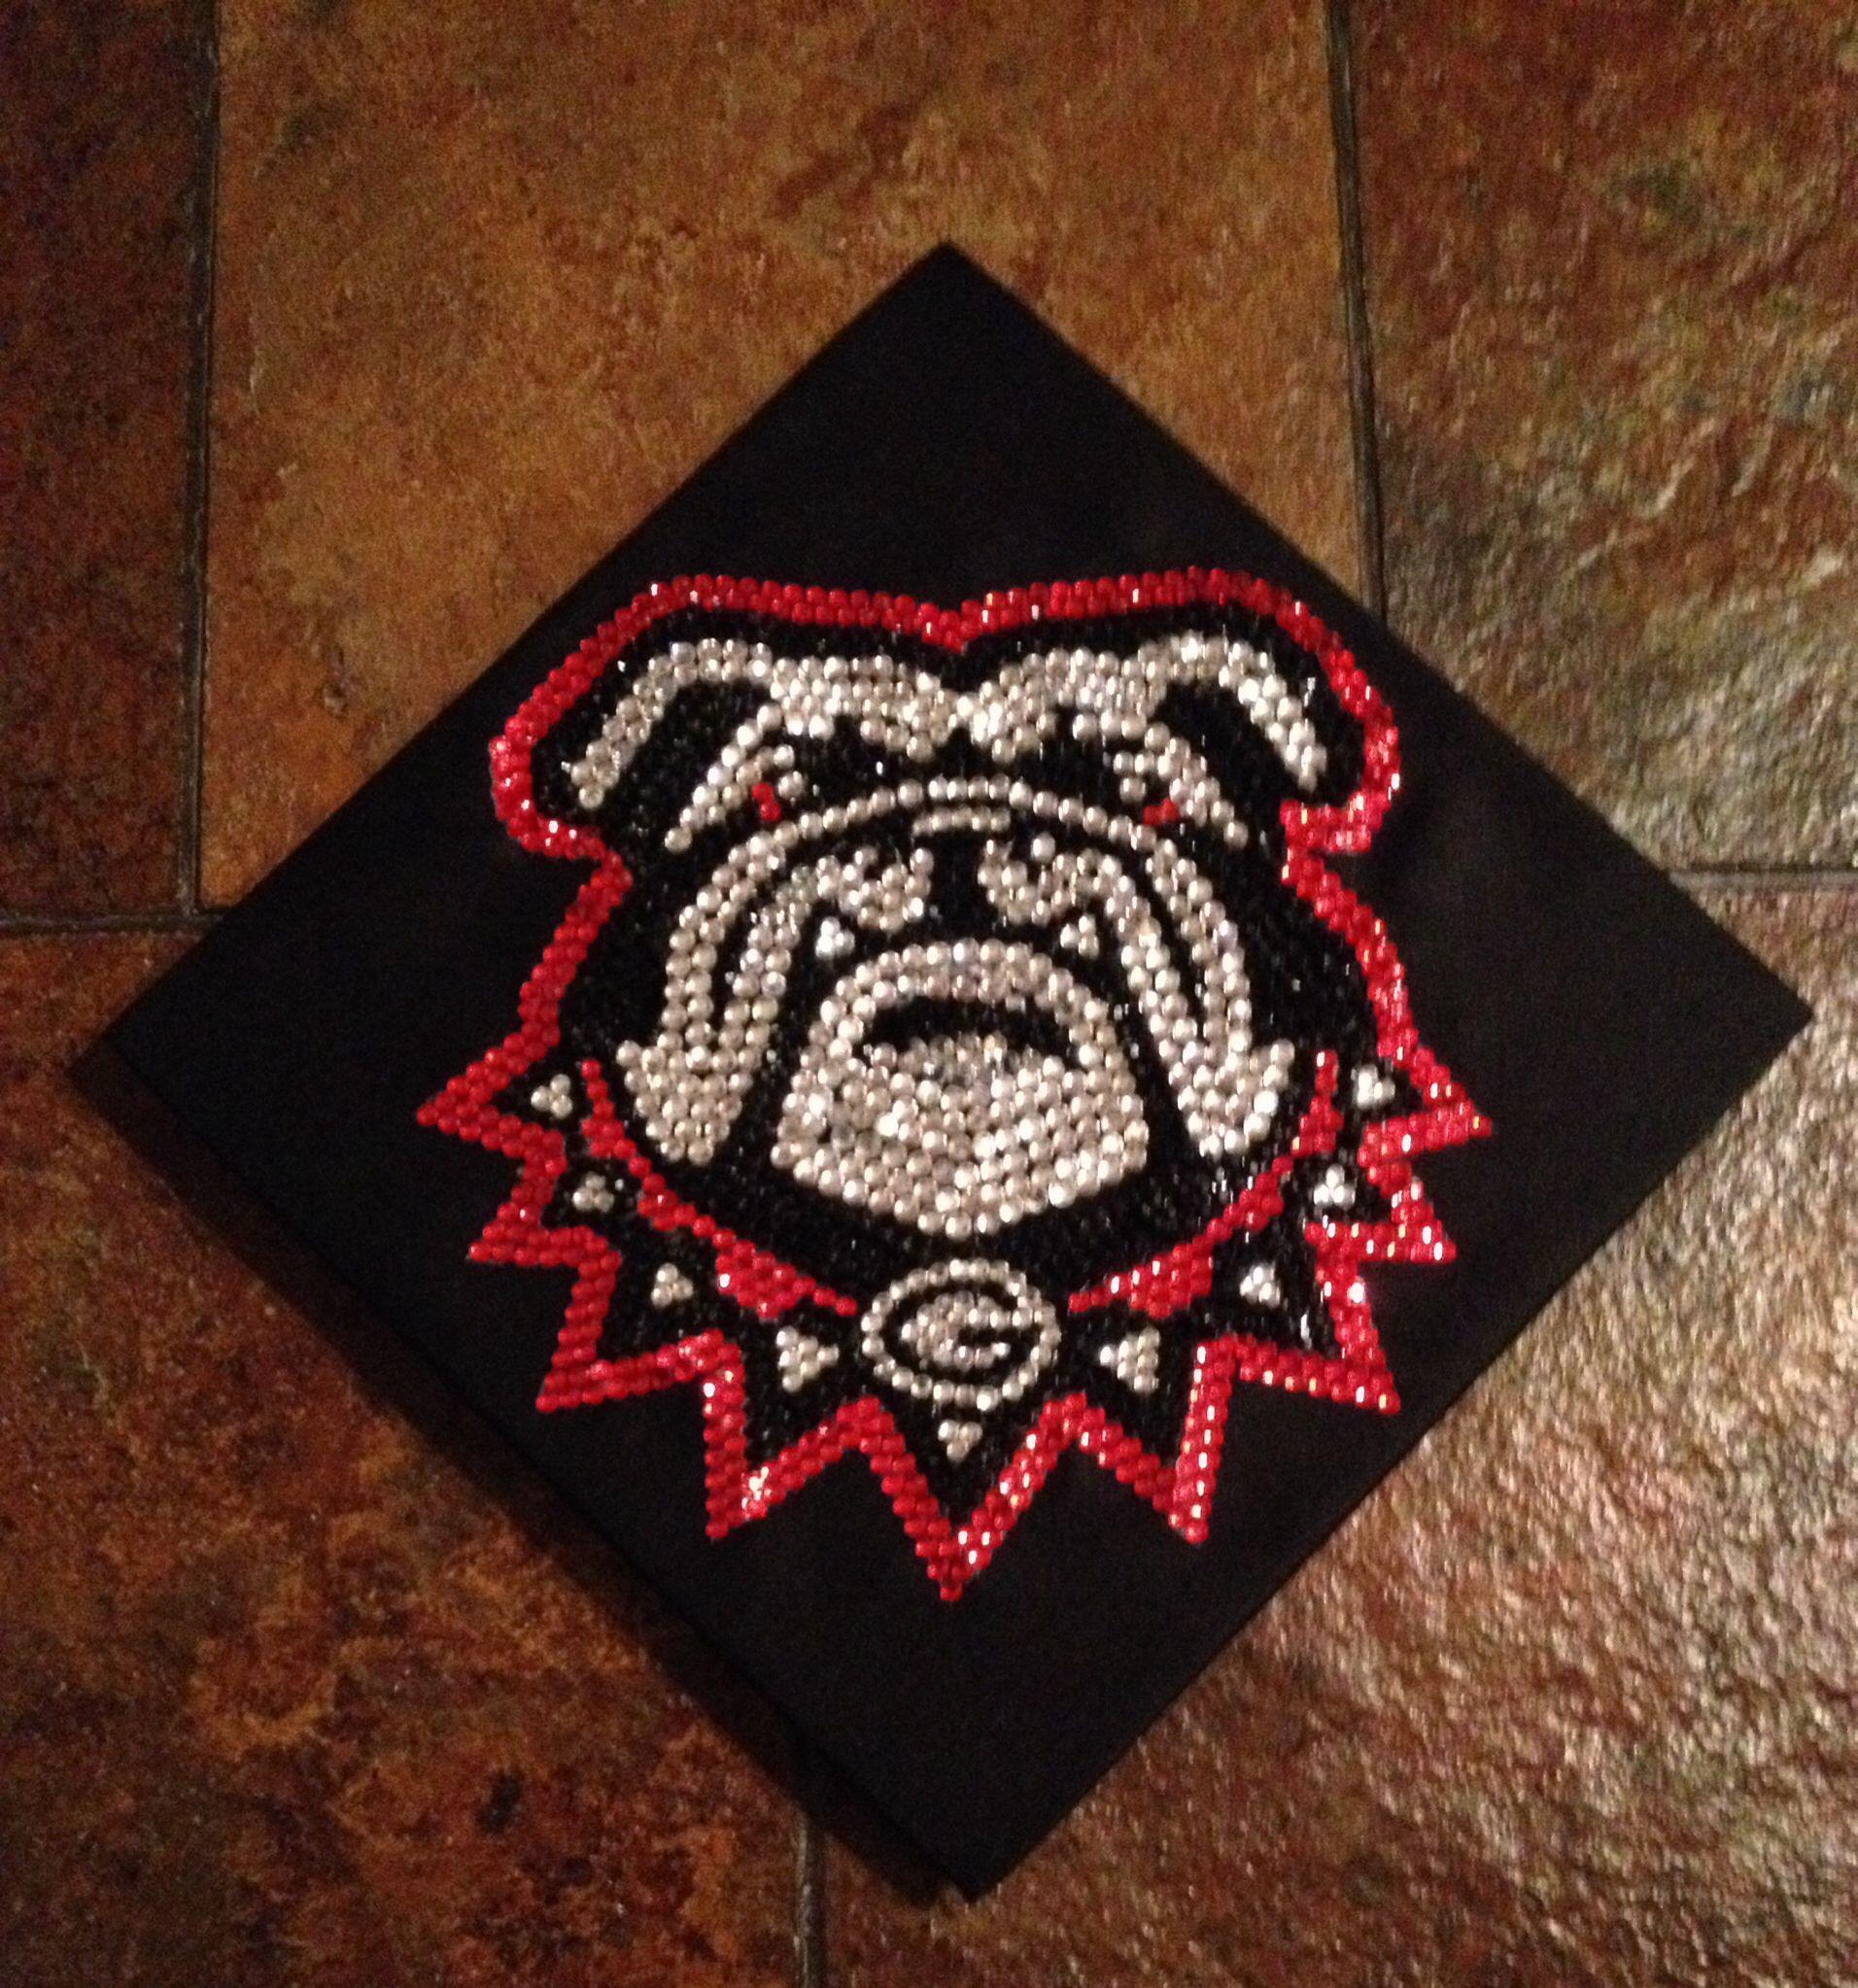 UGA graduation cap with mascot Uga. Use red, black and silver ...